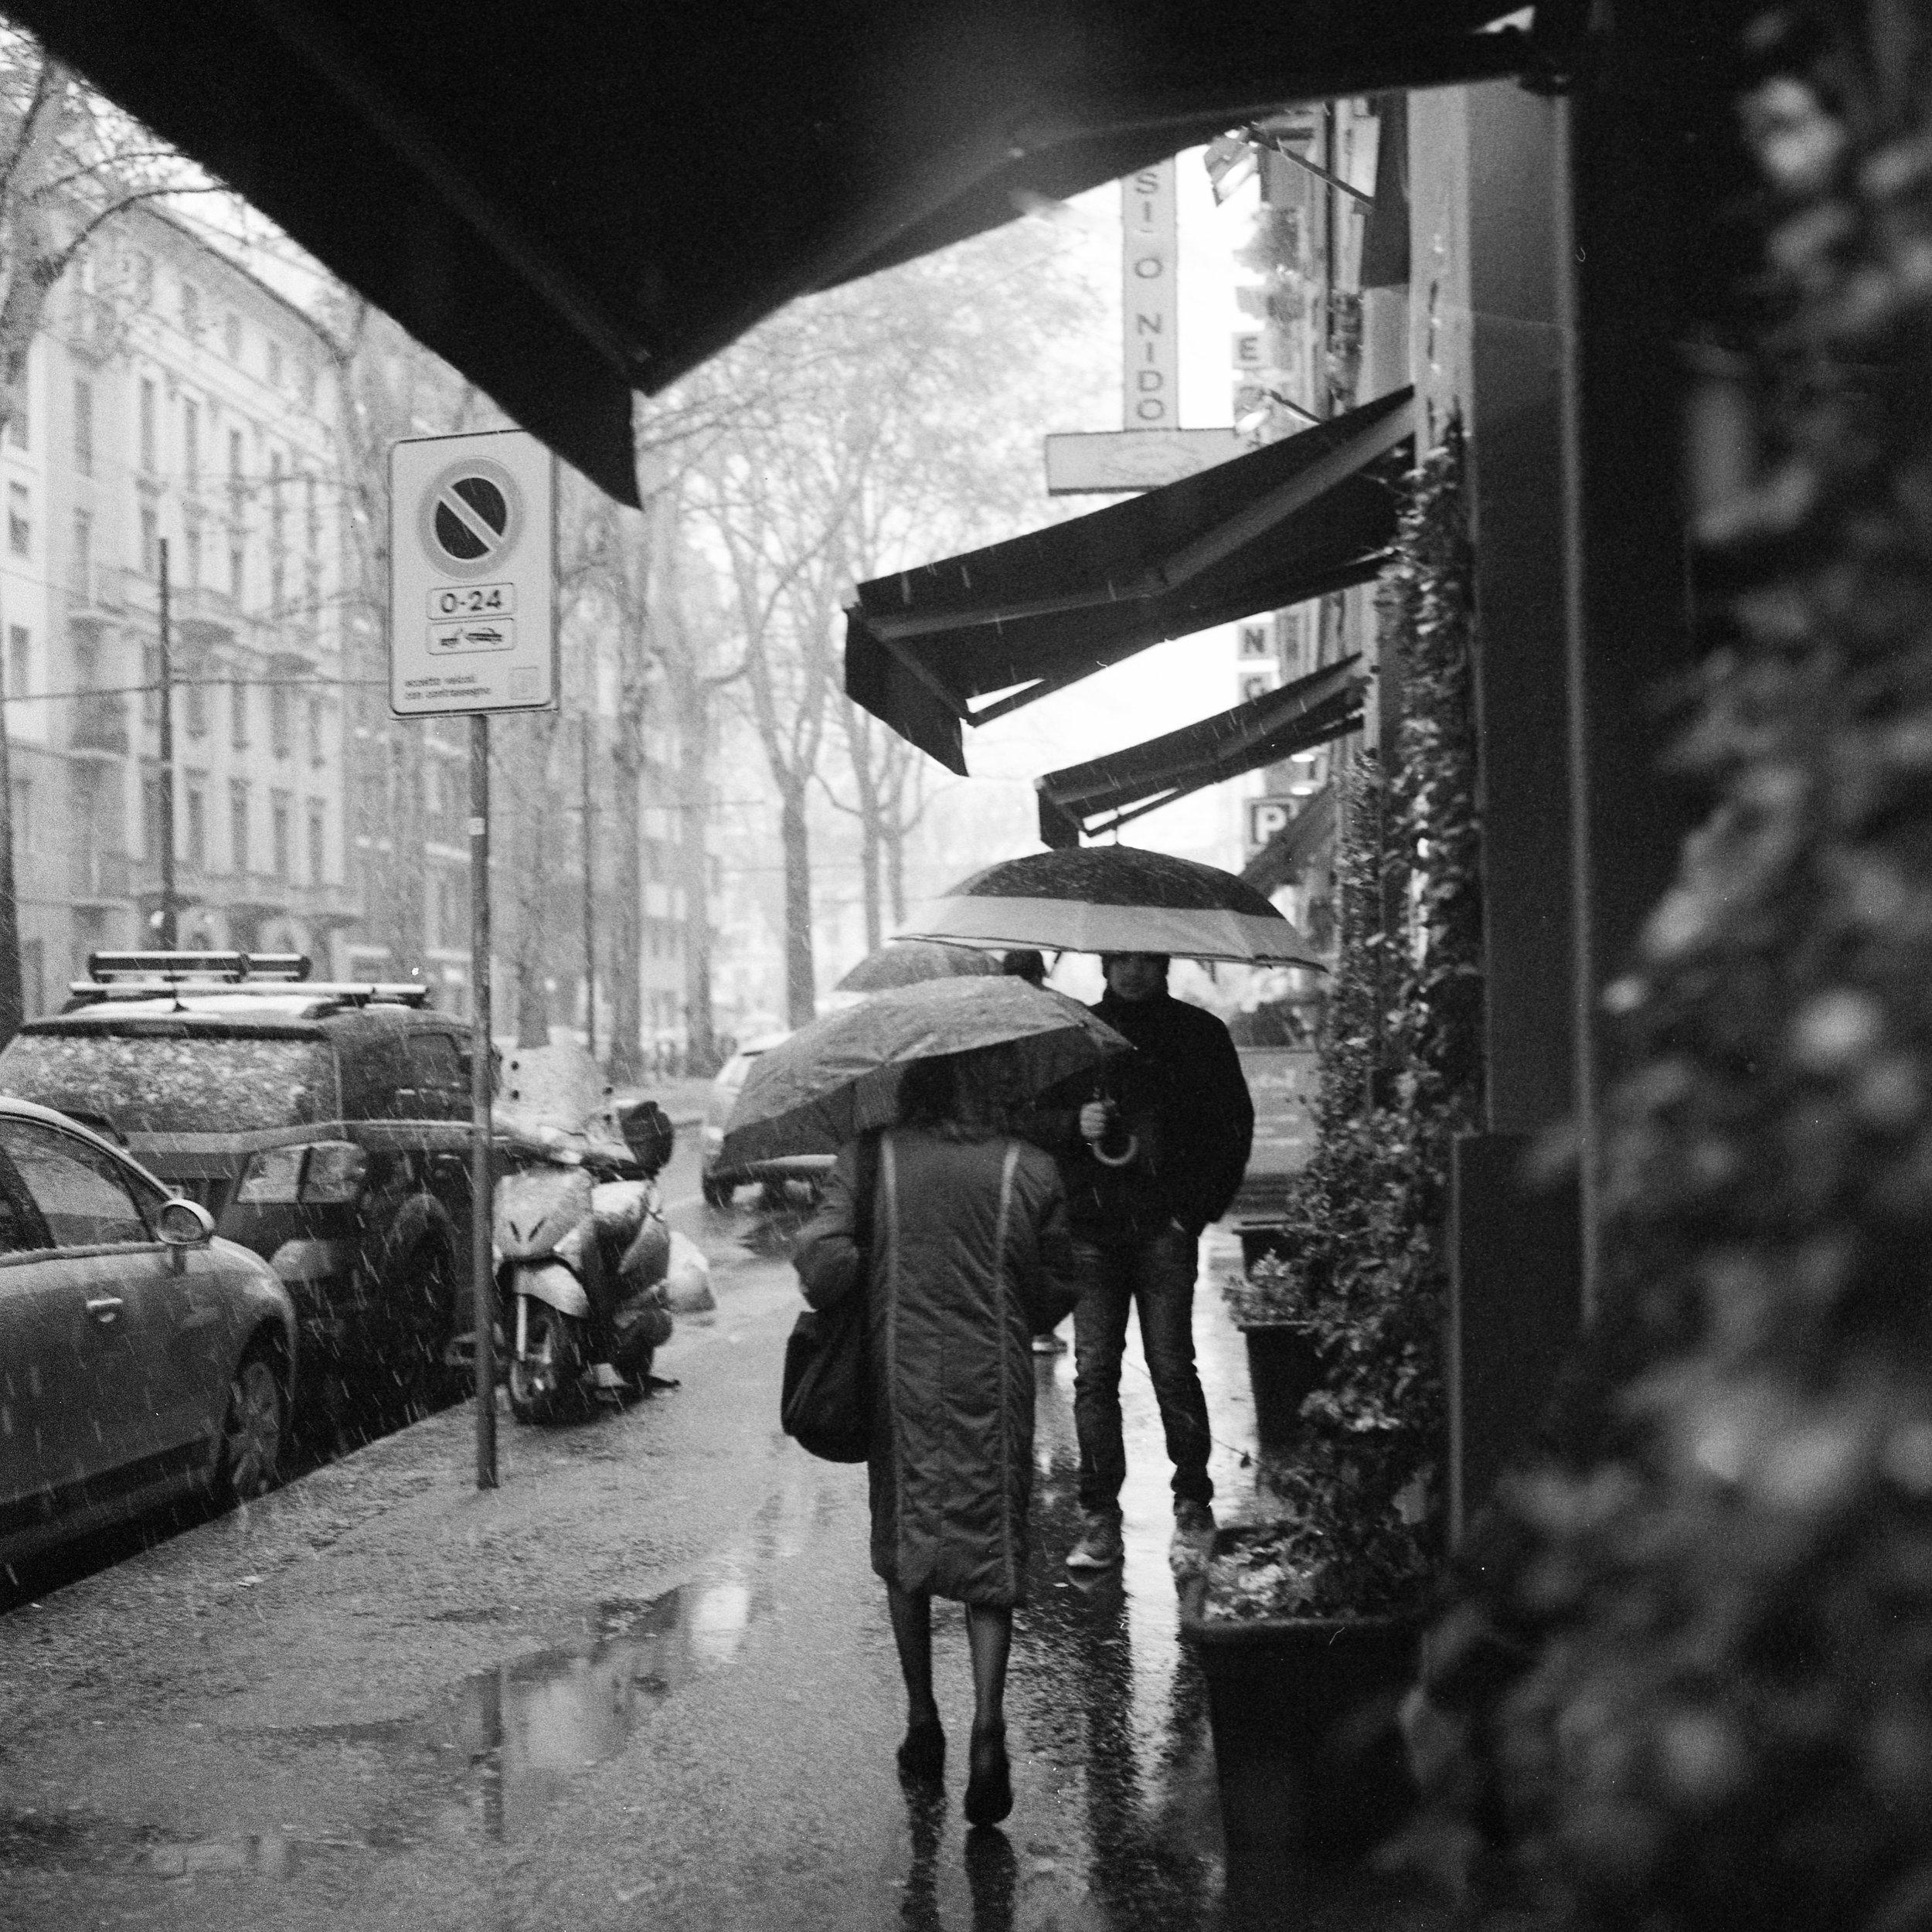 Snow in Milan Hasselblad 501c | Bergger Pancro 400